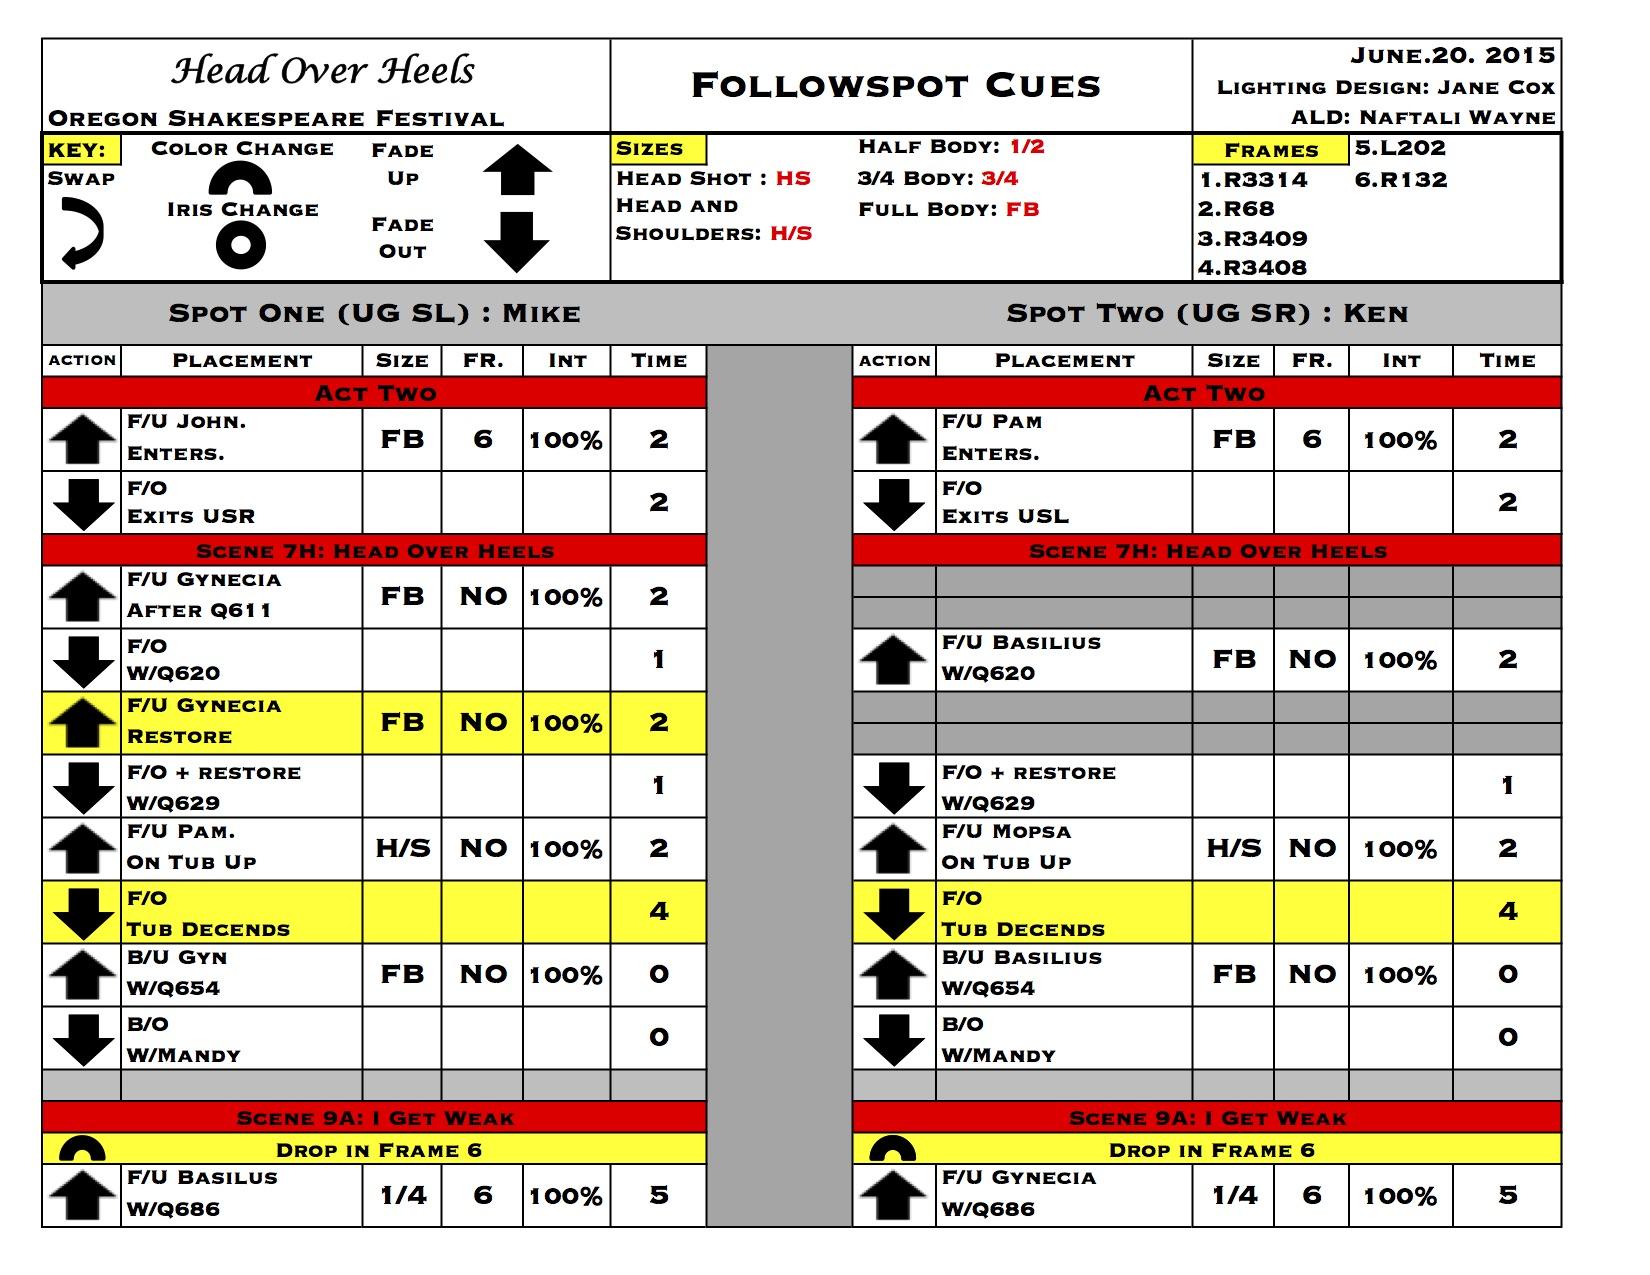 Follow Spot Tracking Sheet - Head Over Heels - OSF 2015 - LD: Jane Cox